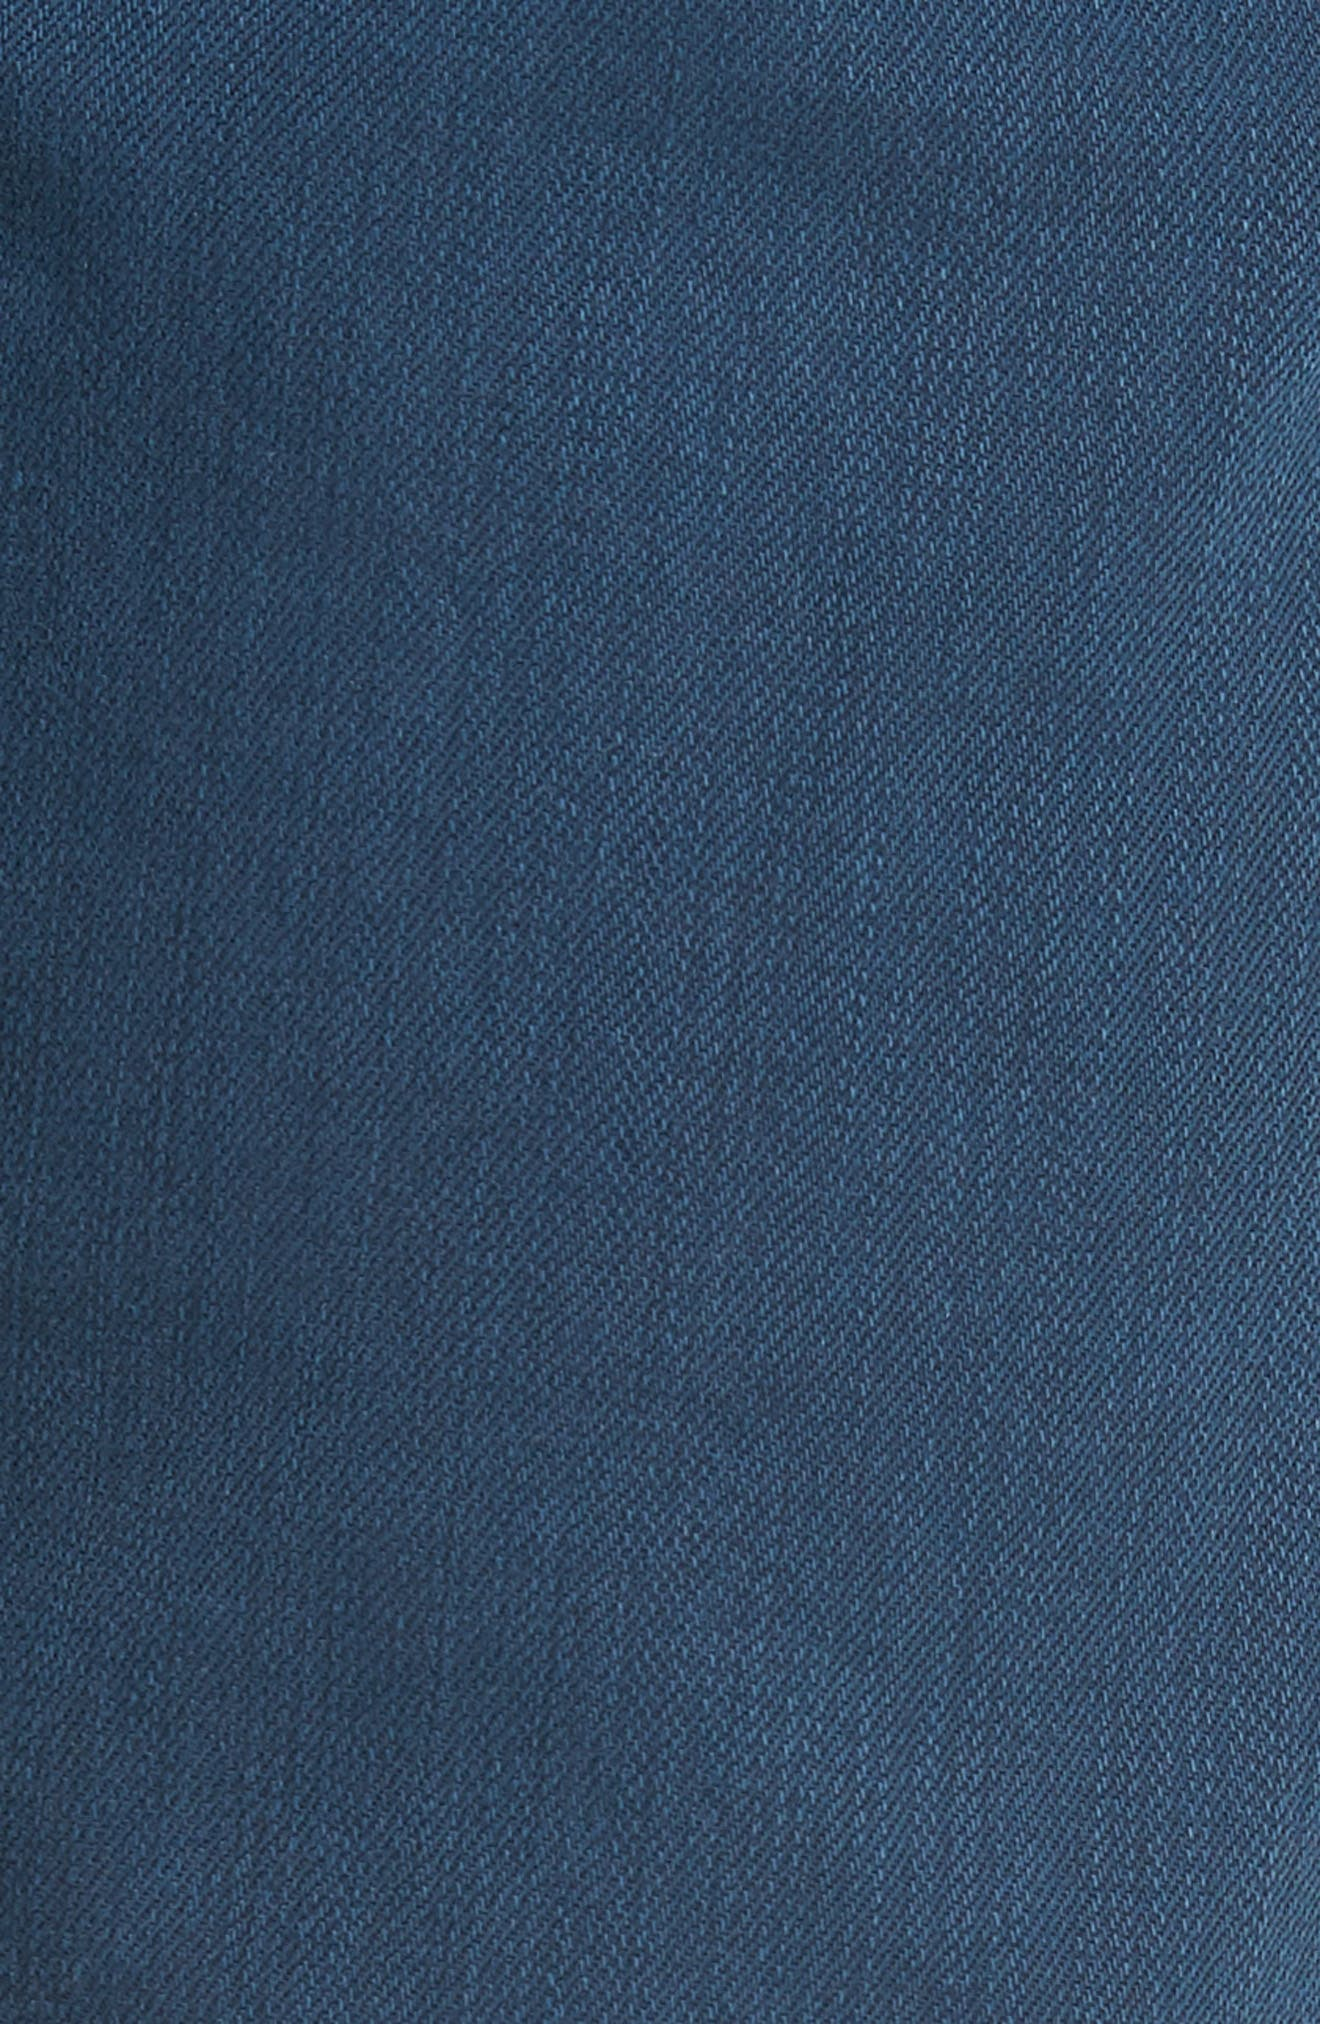 Jimmy Slim Straight Leg Jeans,                             Alternate thumbnail 5, color,                             Marina Blue